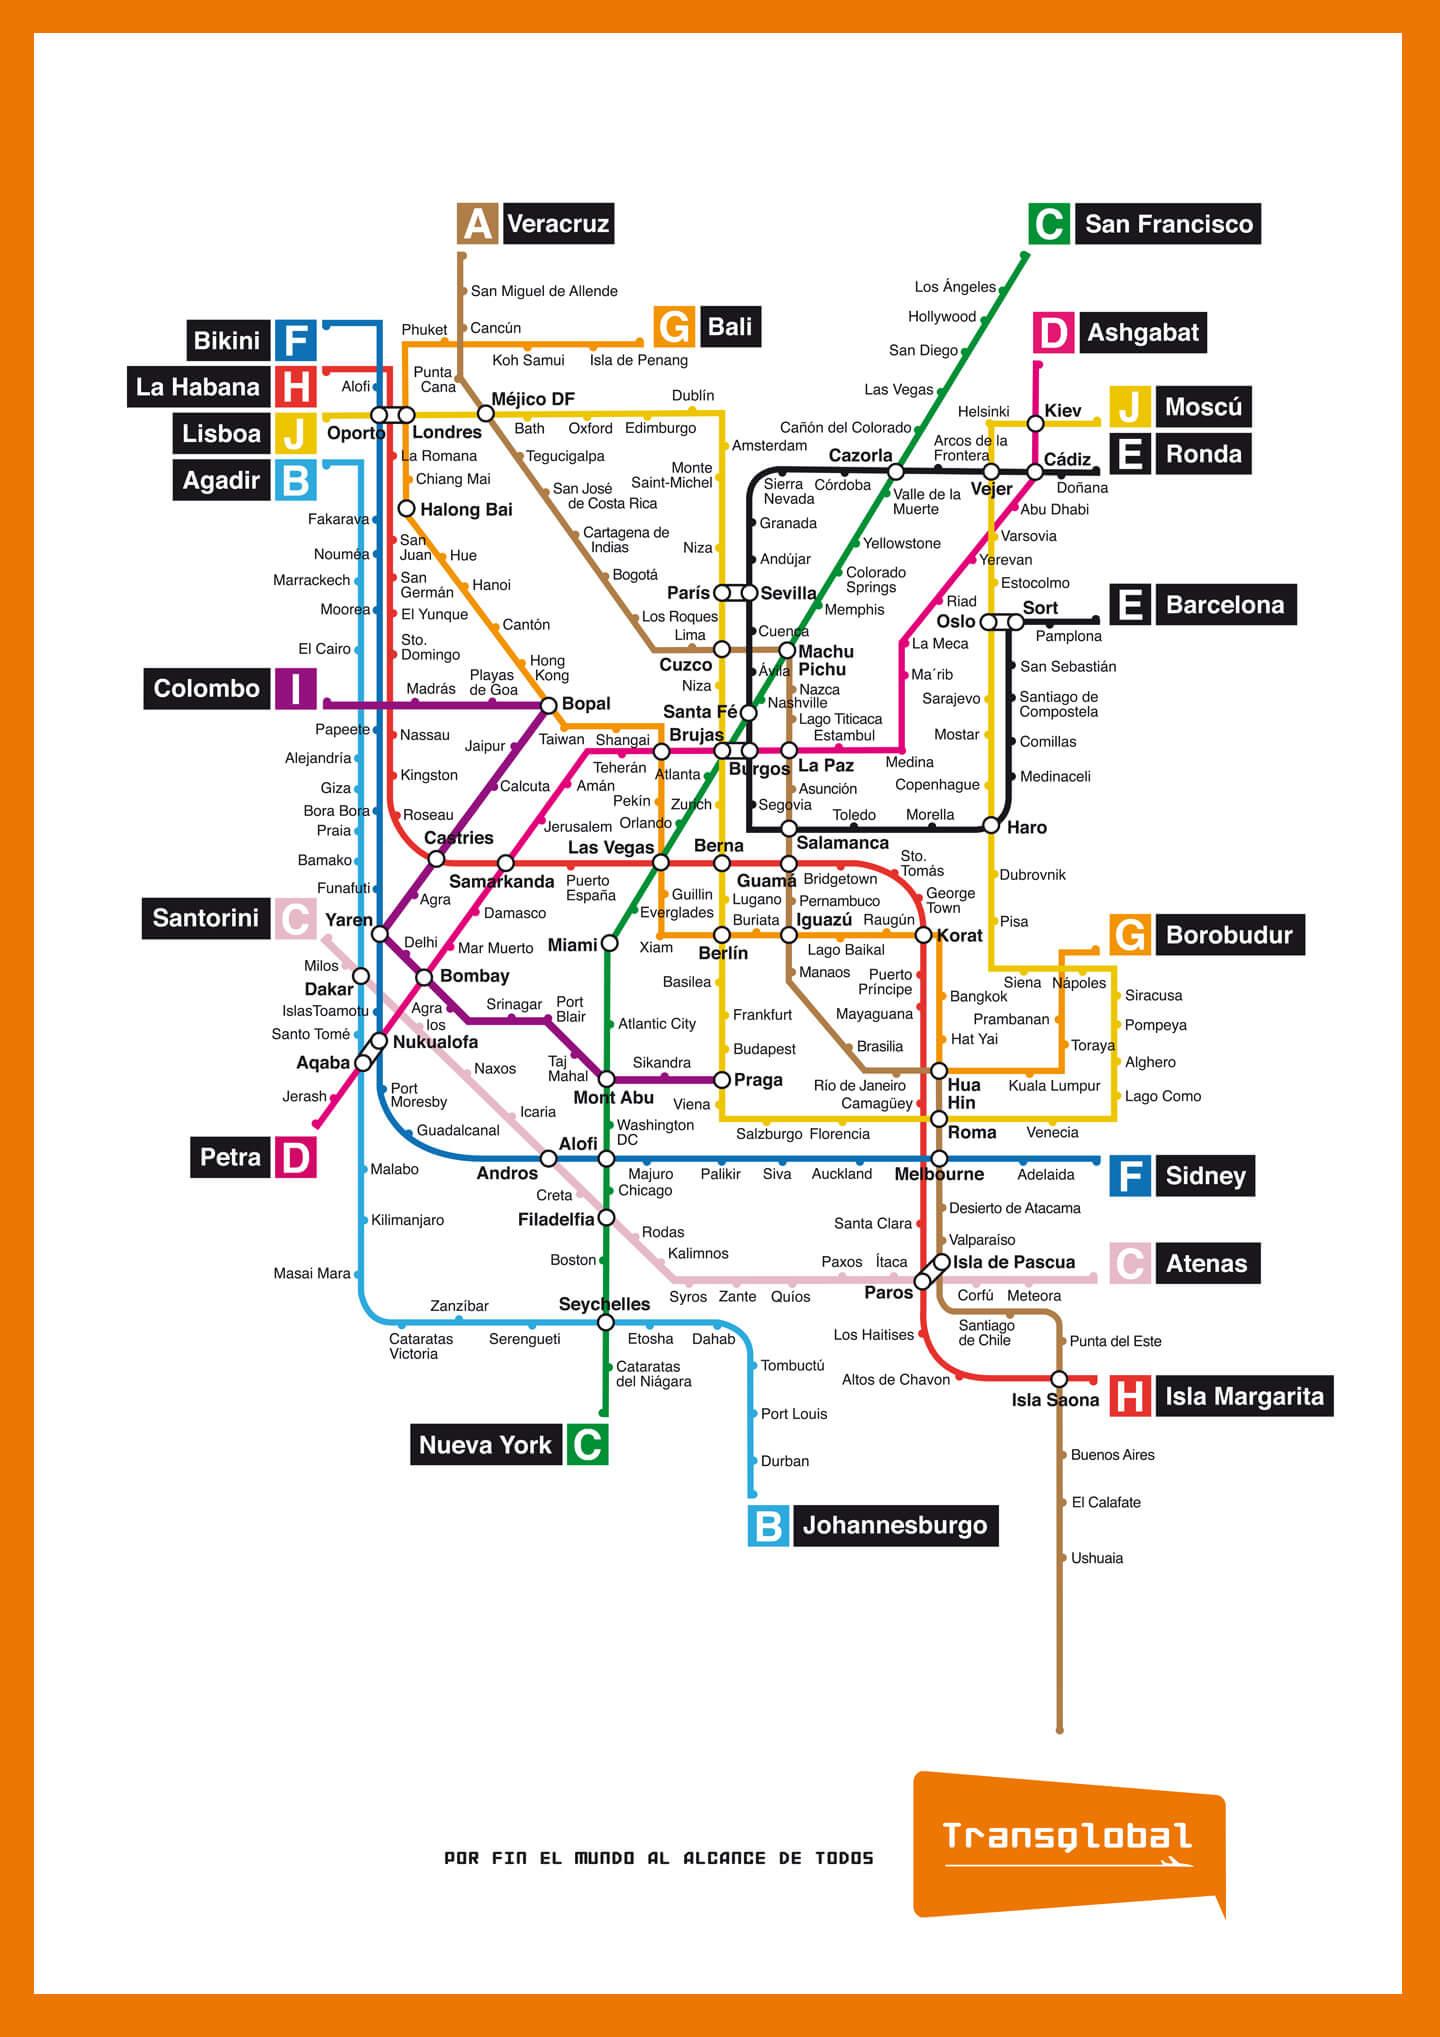 004-transglobal-marquesina-metro